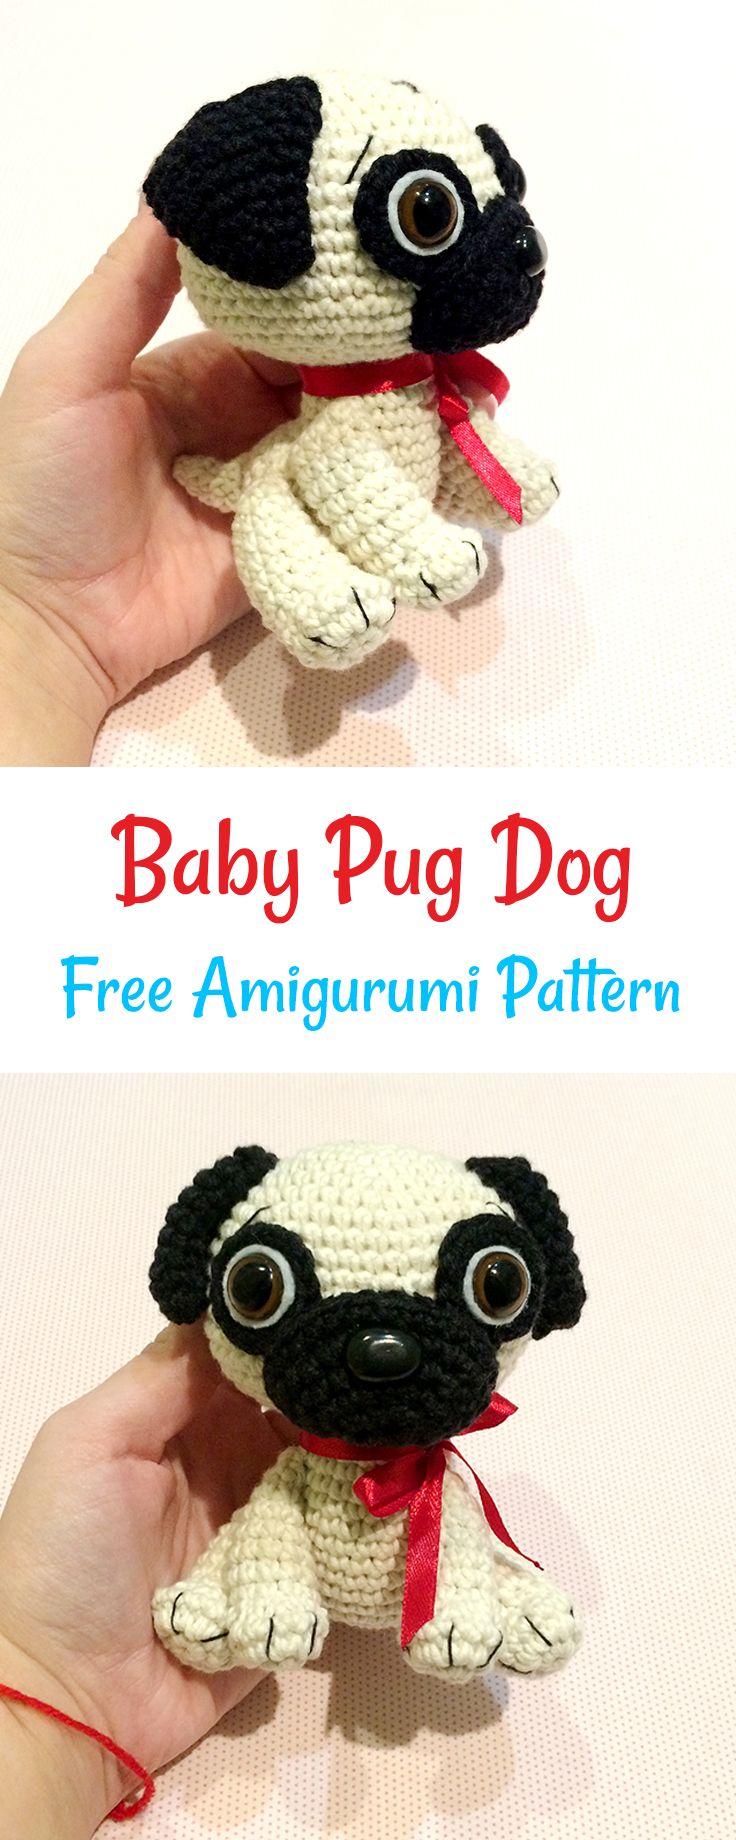 Free crochet baby pug dog pattern #crochet #amigurumi | crochet toys ...